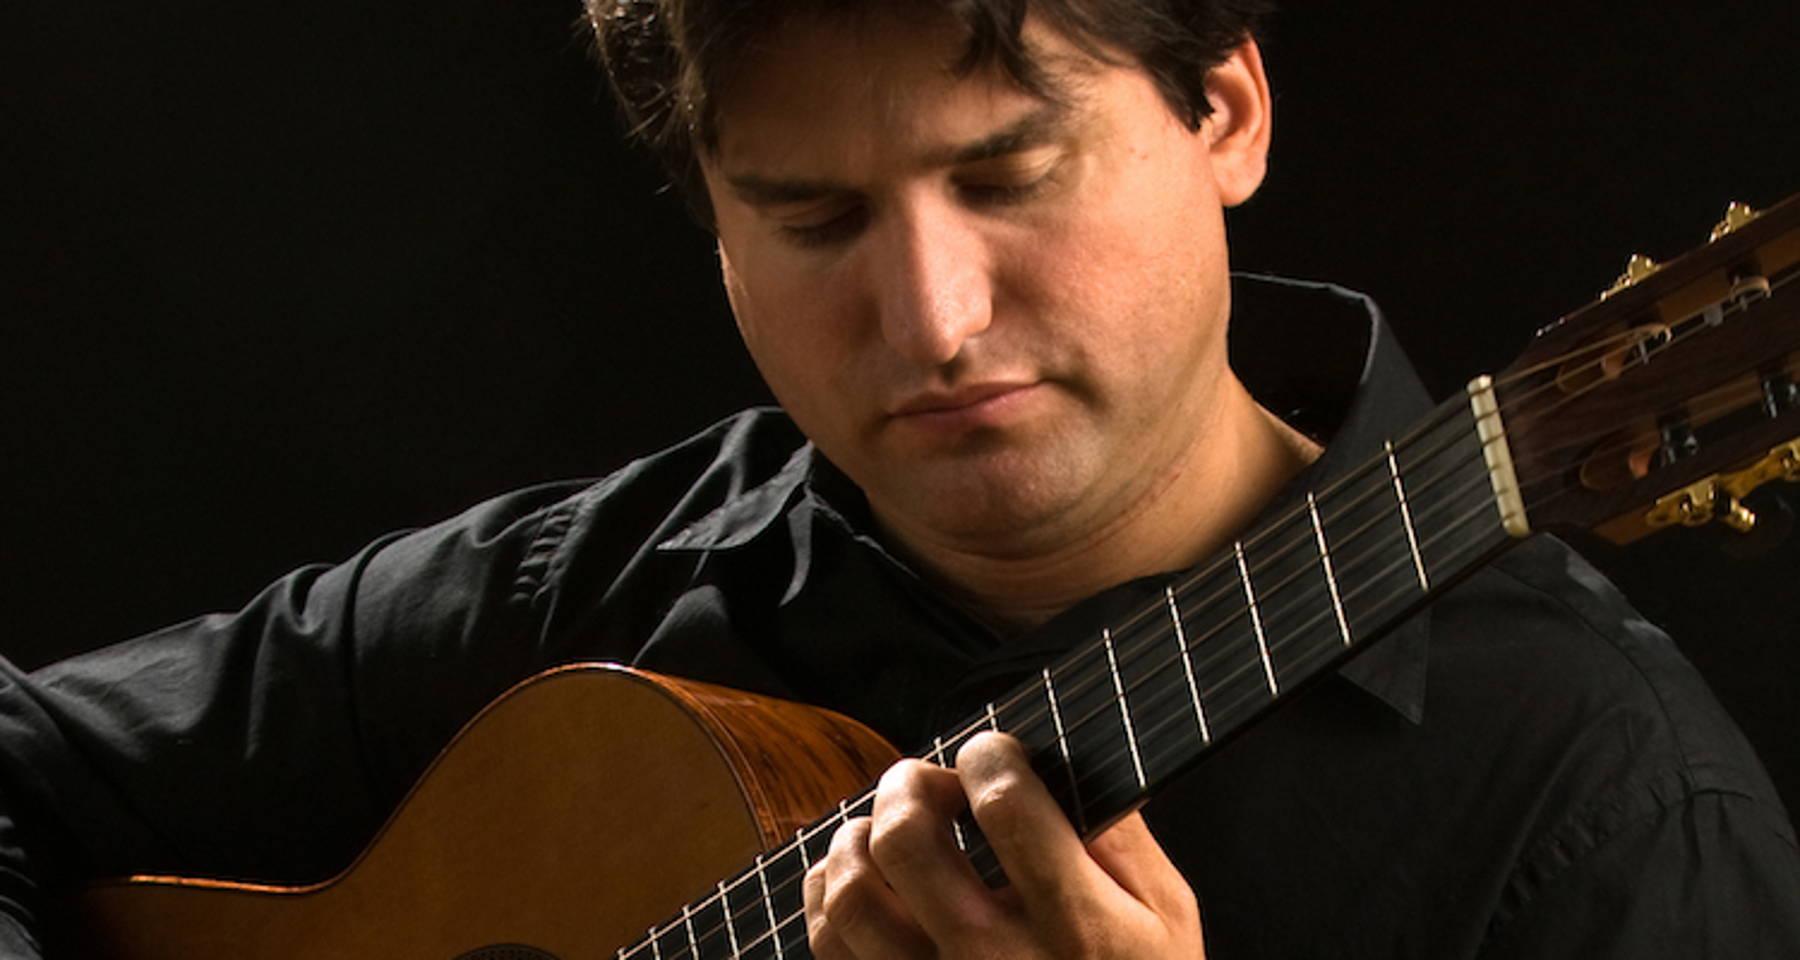 René Izquierdo, Cuban Guitar Virtuoso in Concert